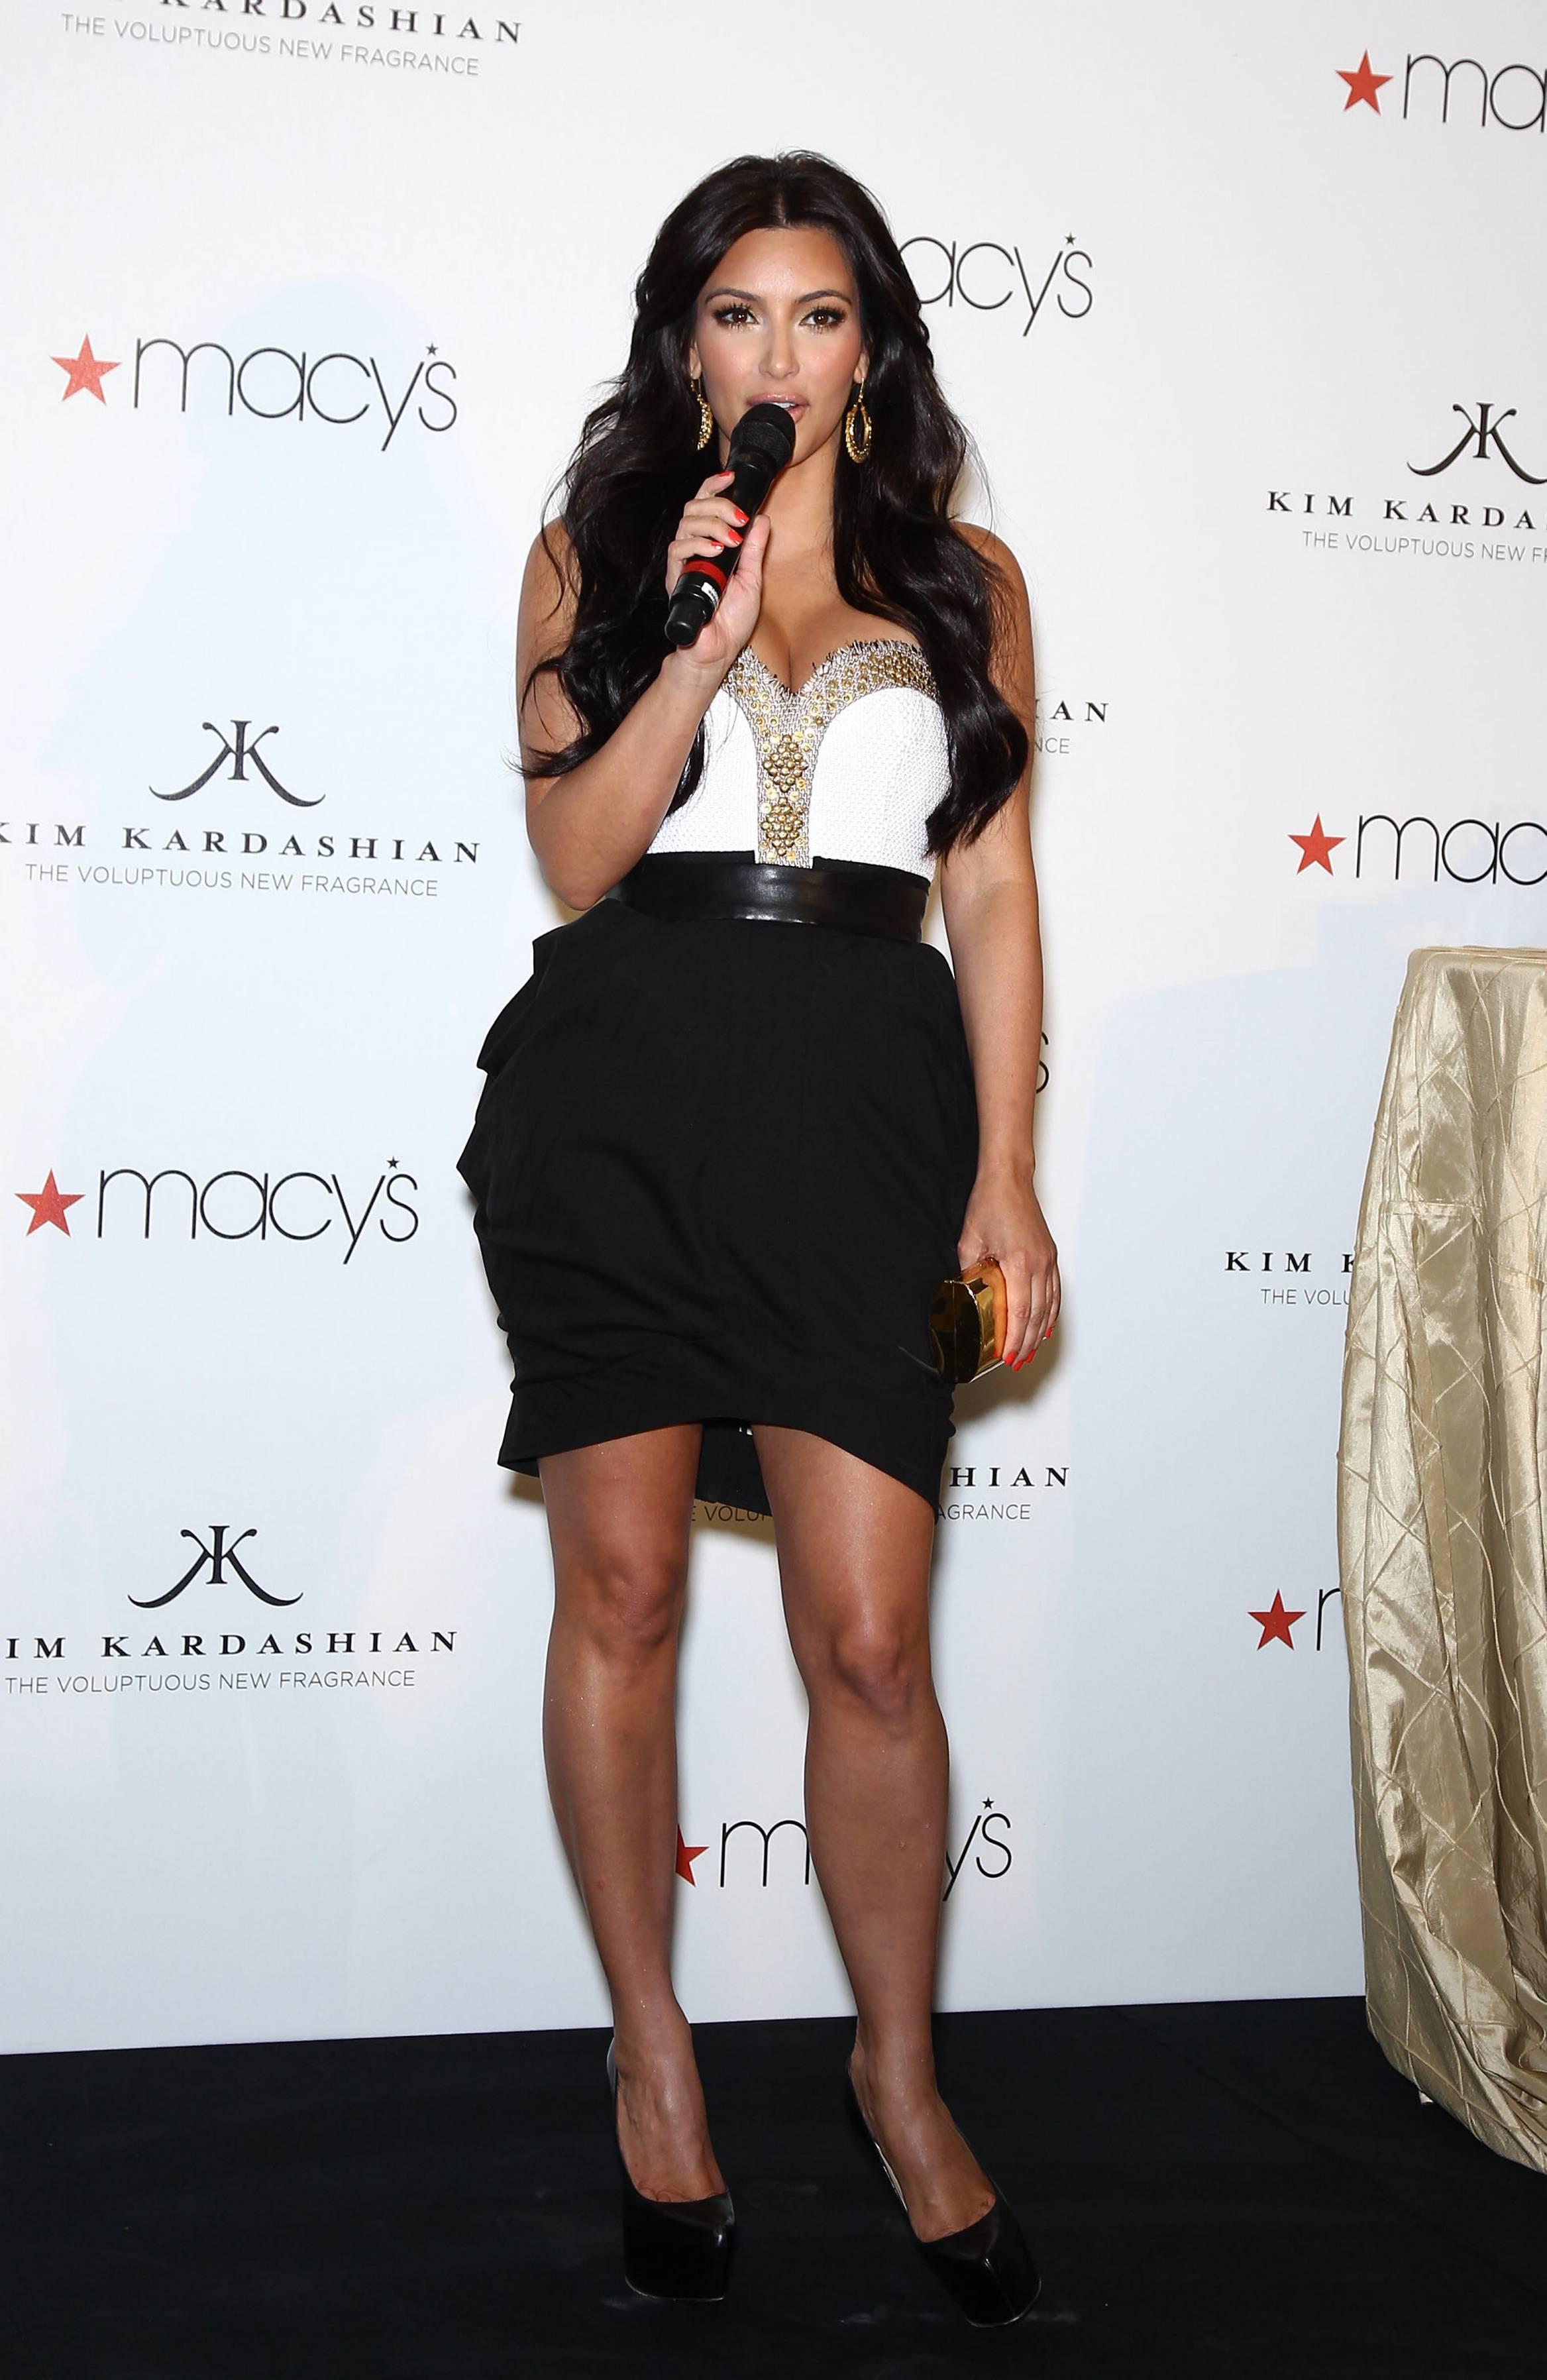 85379_celebrity_paradise.com_Kim_Kardashian_Fragance_05_122_183lo.jpg